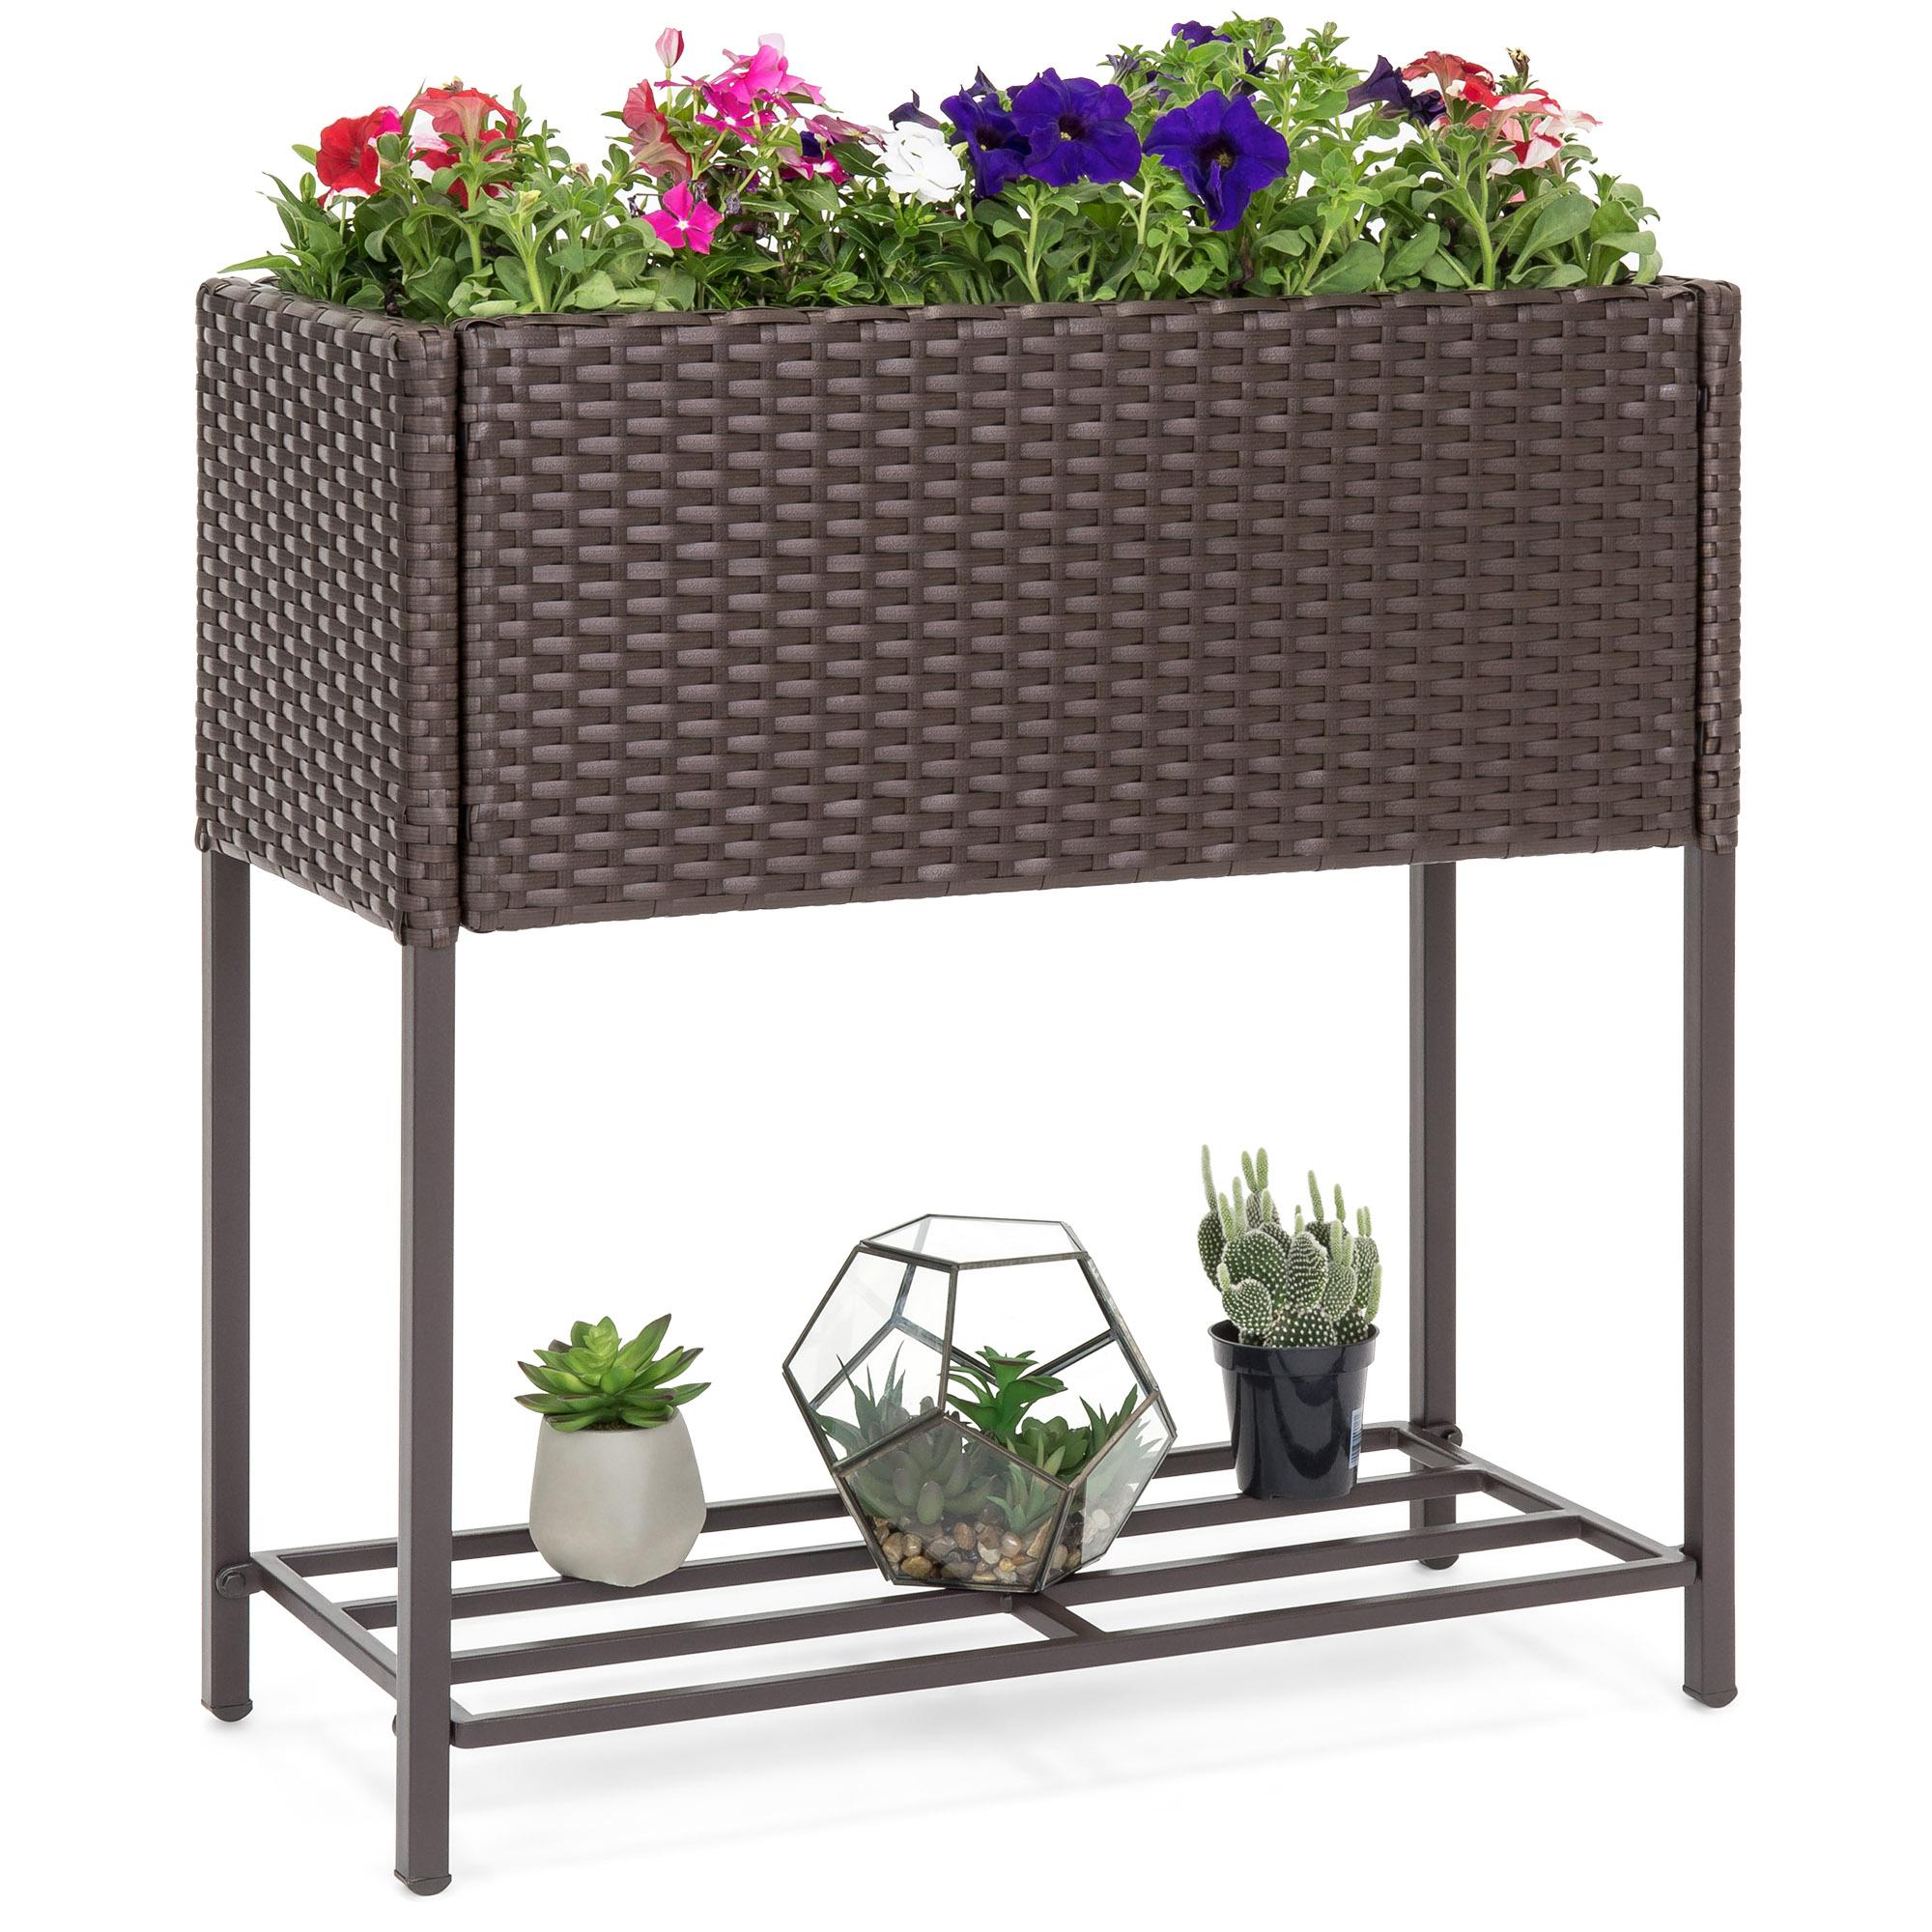 BCP 2-Tier Indoor Outdoor Wicker Raised Flower Planter Box